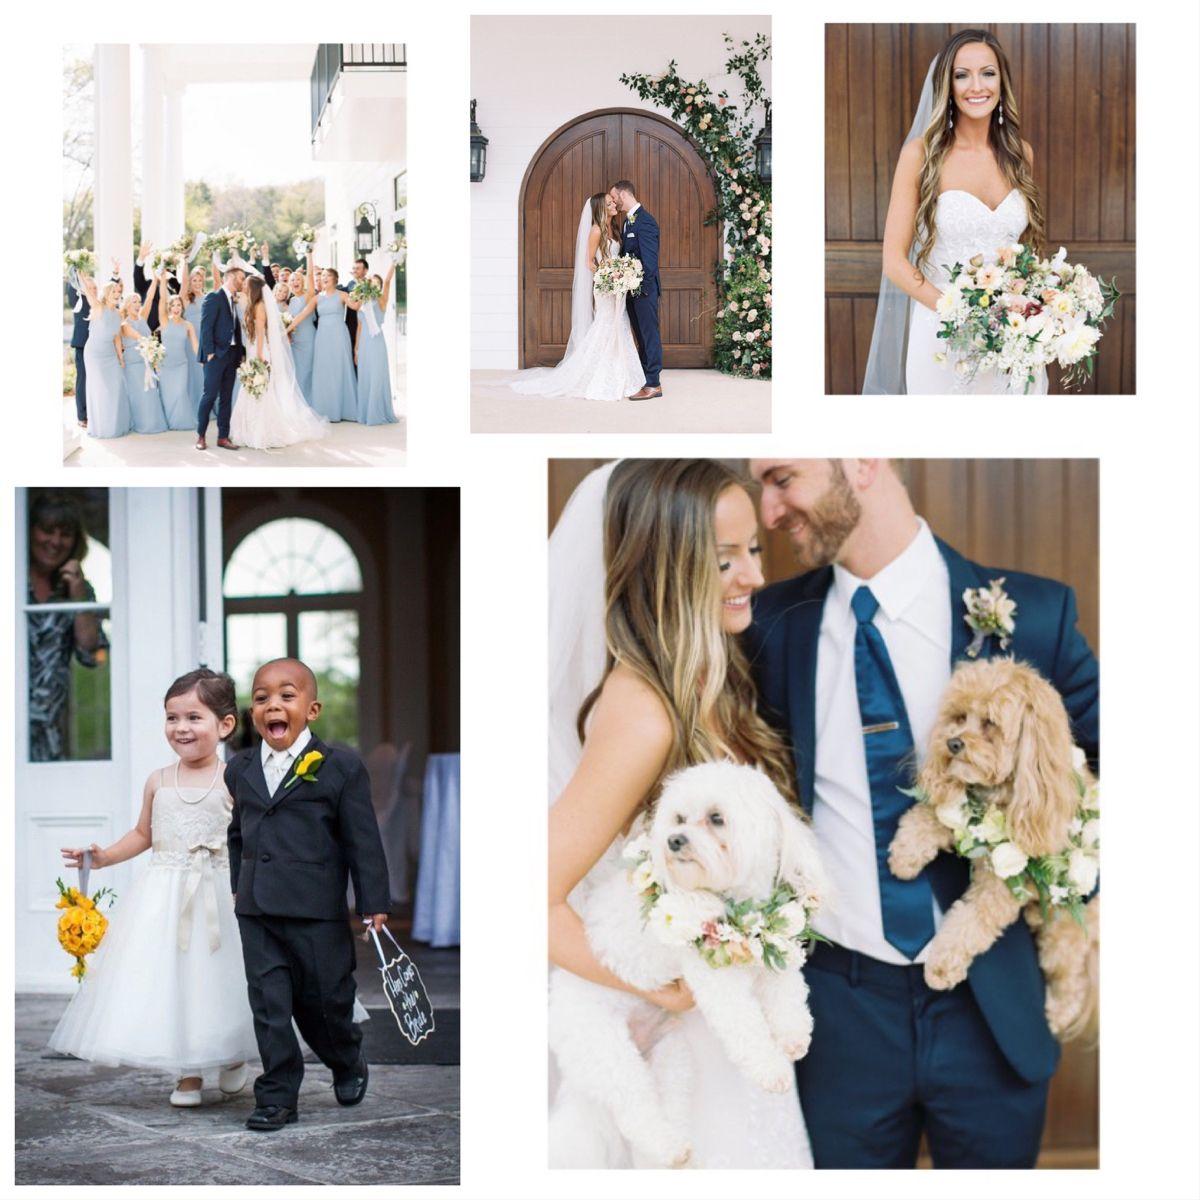 Italian wedding attire wedding attire bride wear light